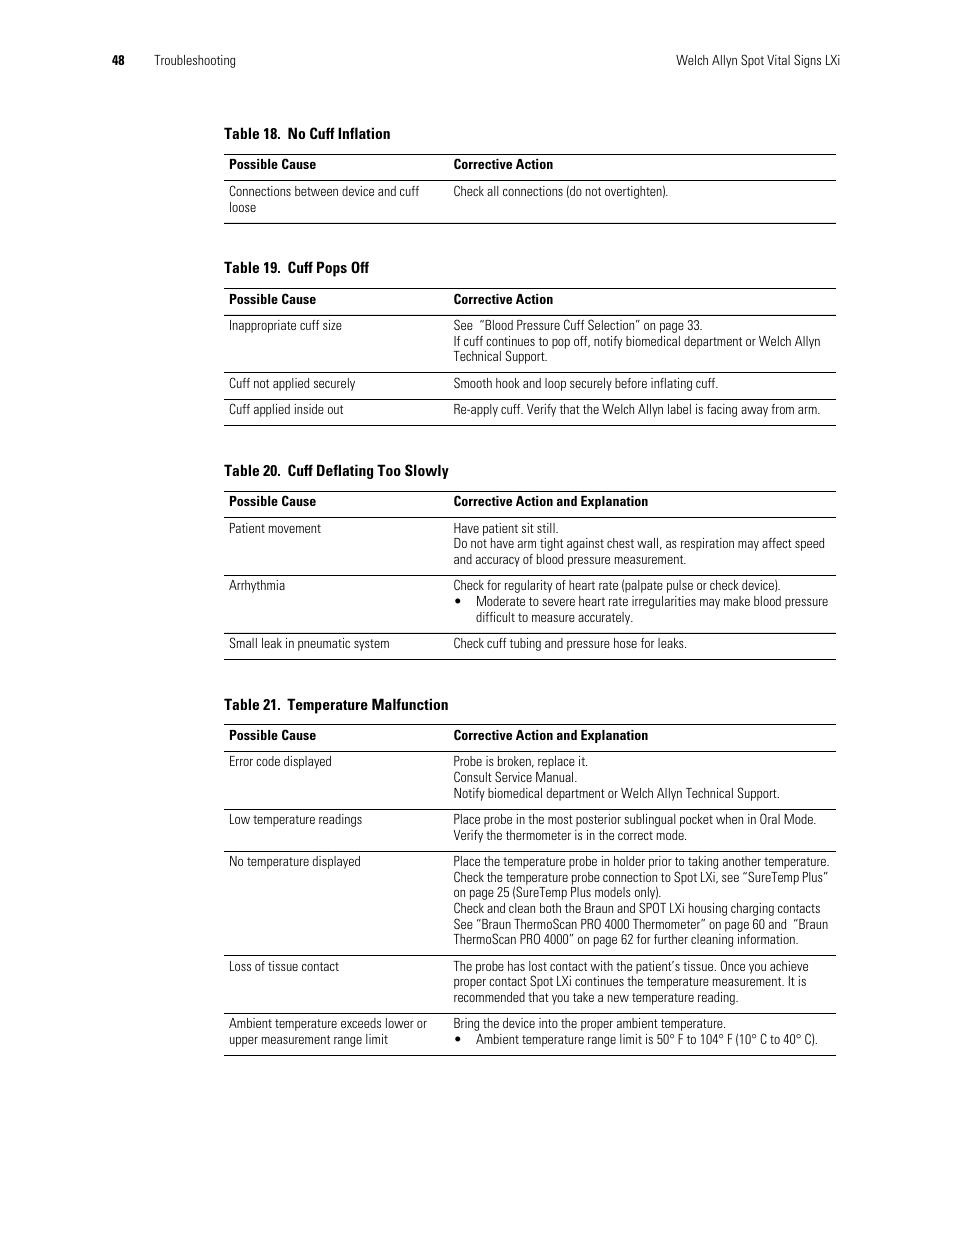 welch allyn spot vital signs lxi user manual user manual page 58 rh manualsdir com alto 800 lxi user manual pdf wagon r lxi user manual pdf